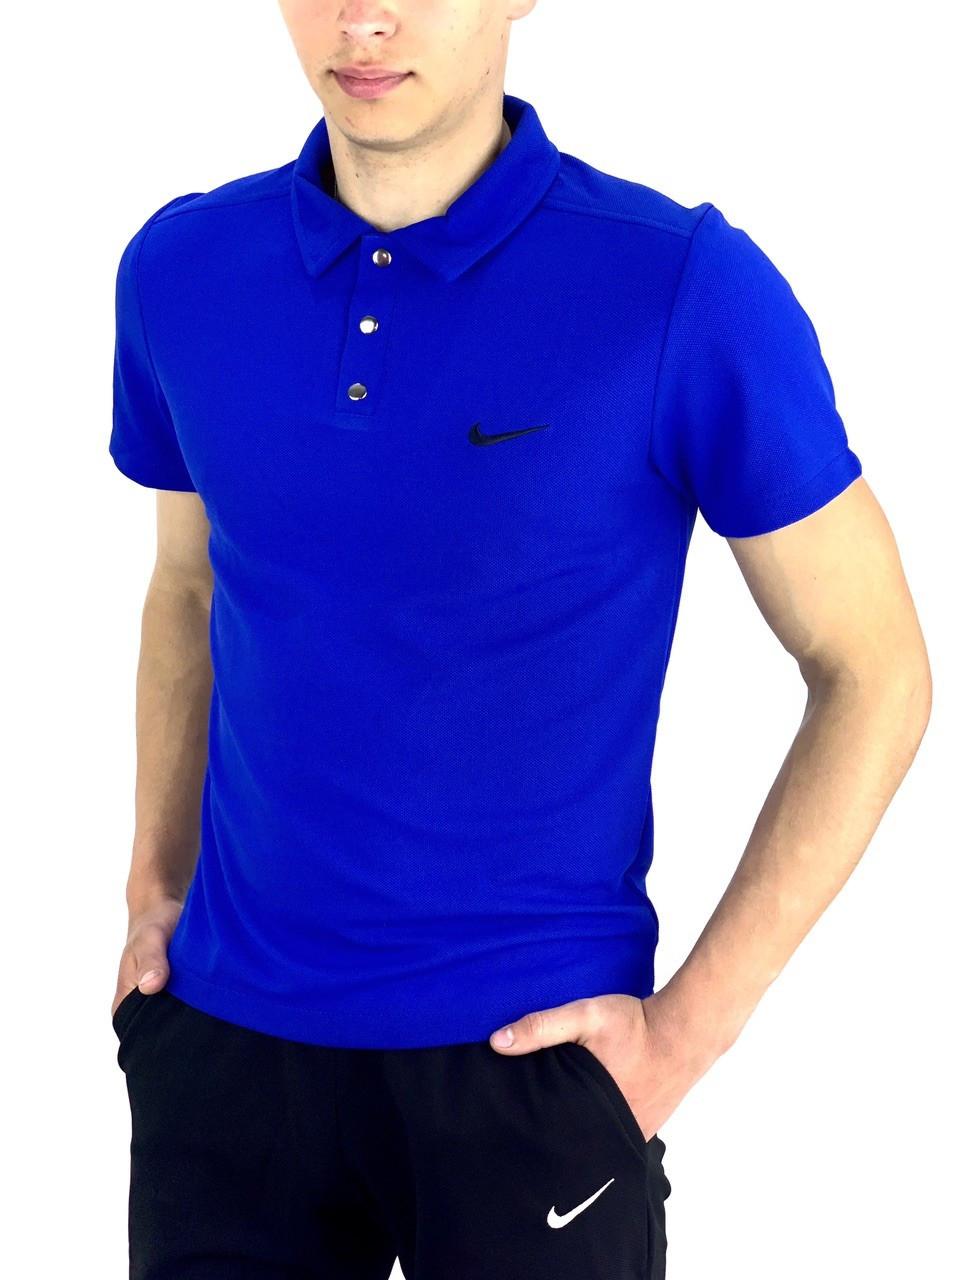 Мужская синяя повседневная футболка поло Nike (реплика)